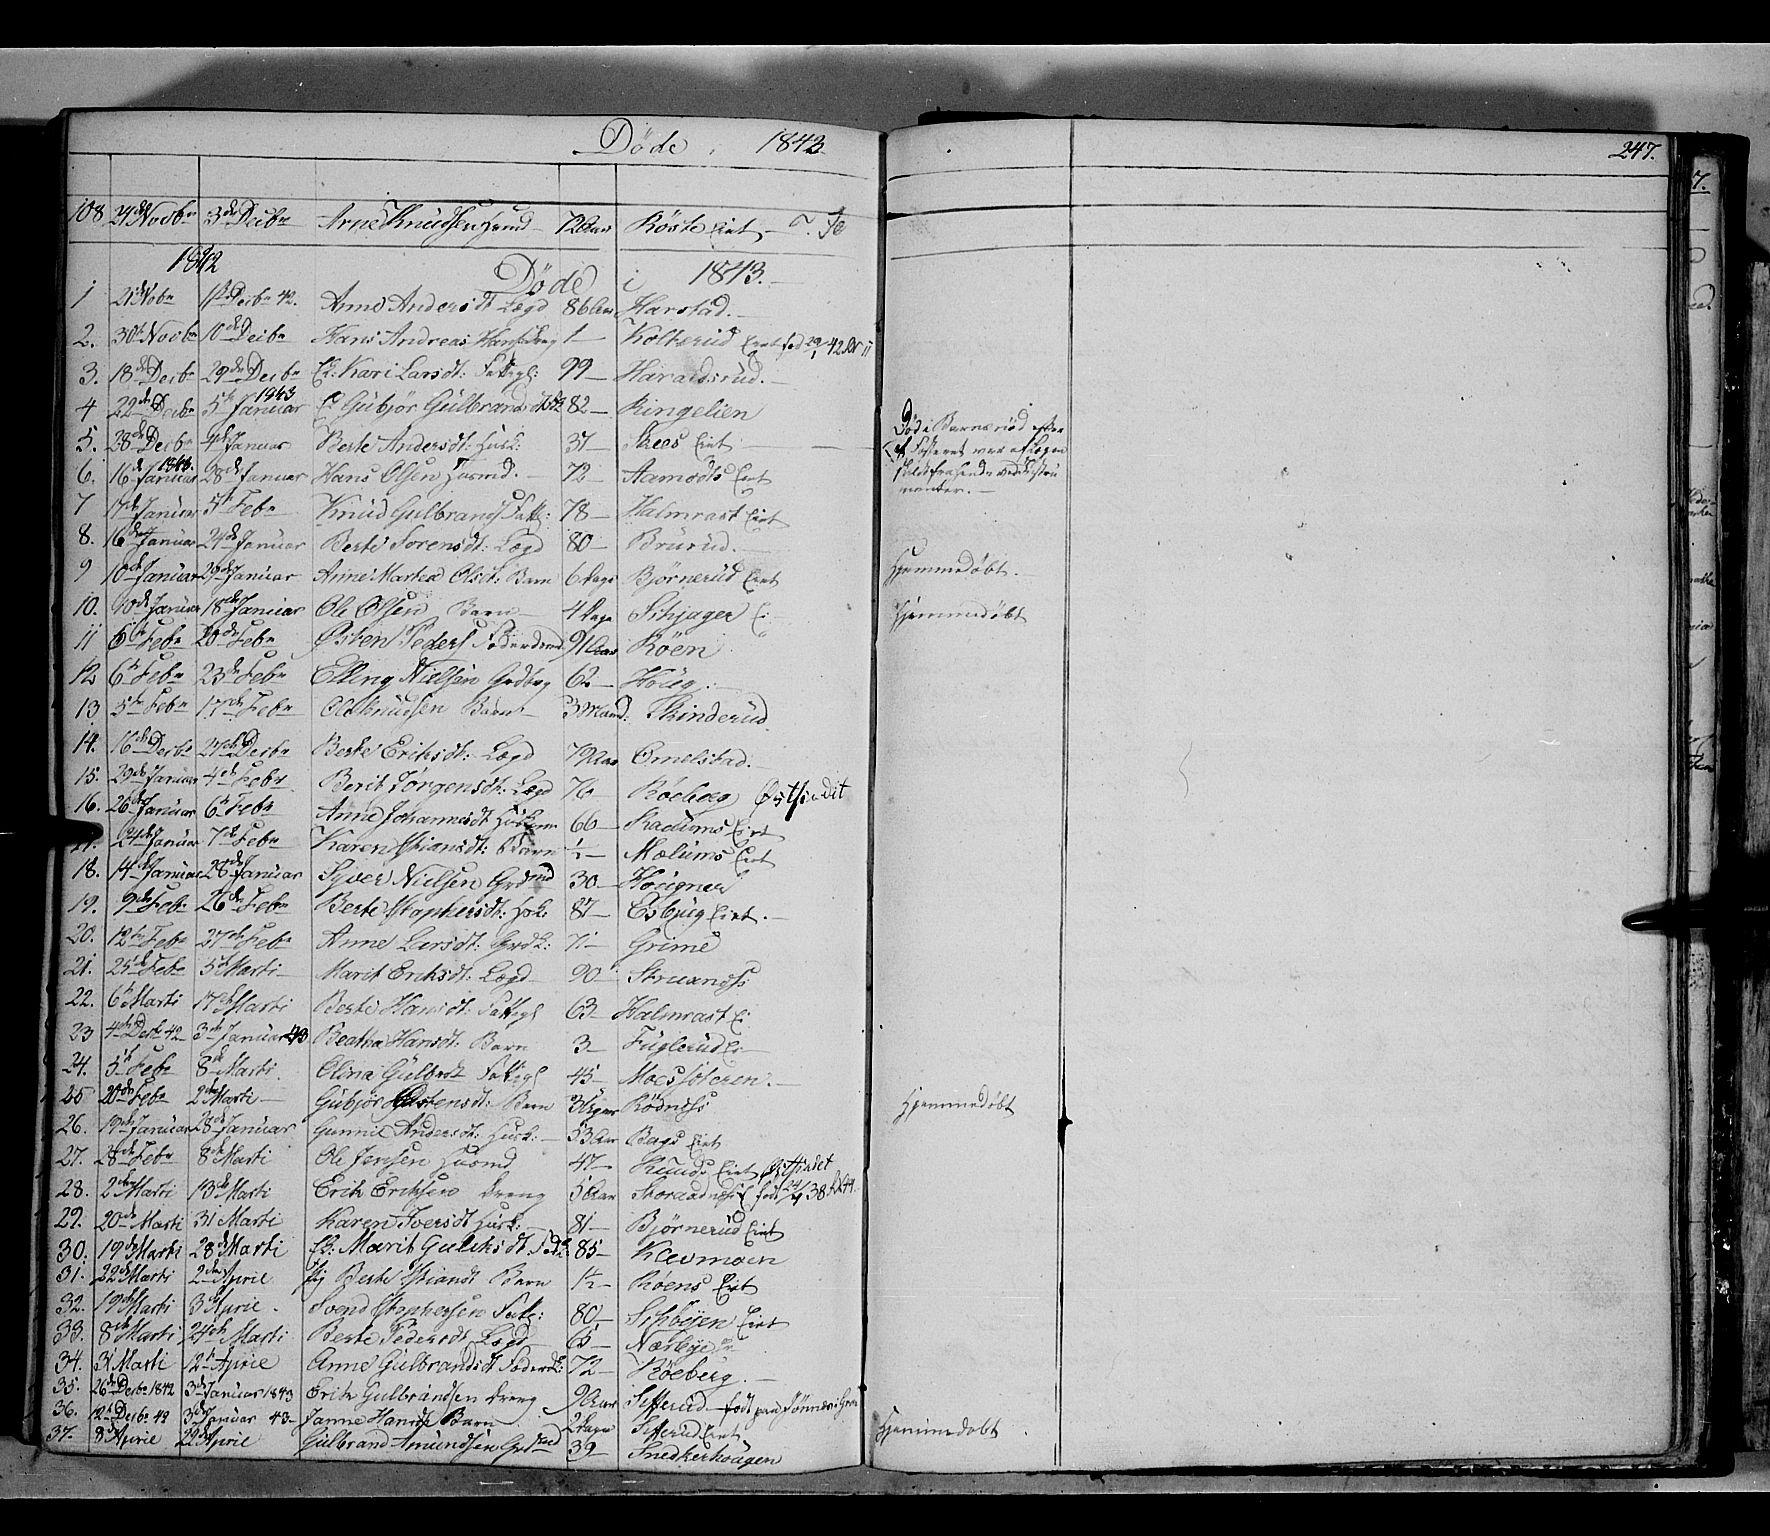 SAH, Land prestekontor, Klokkerbok nr. 2, 1833-1849, s. 247